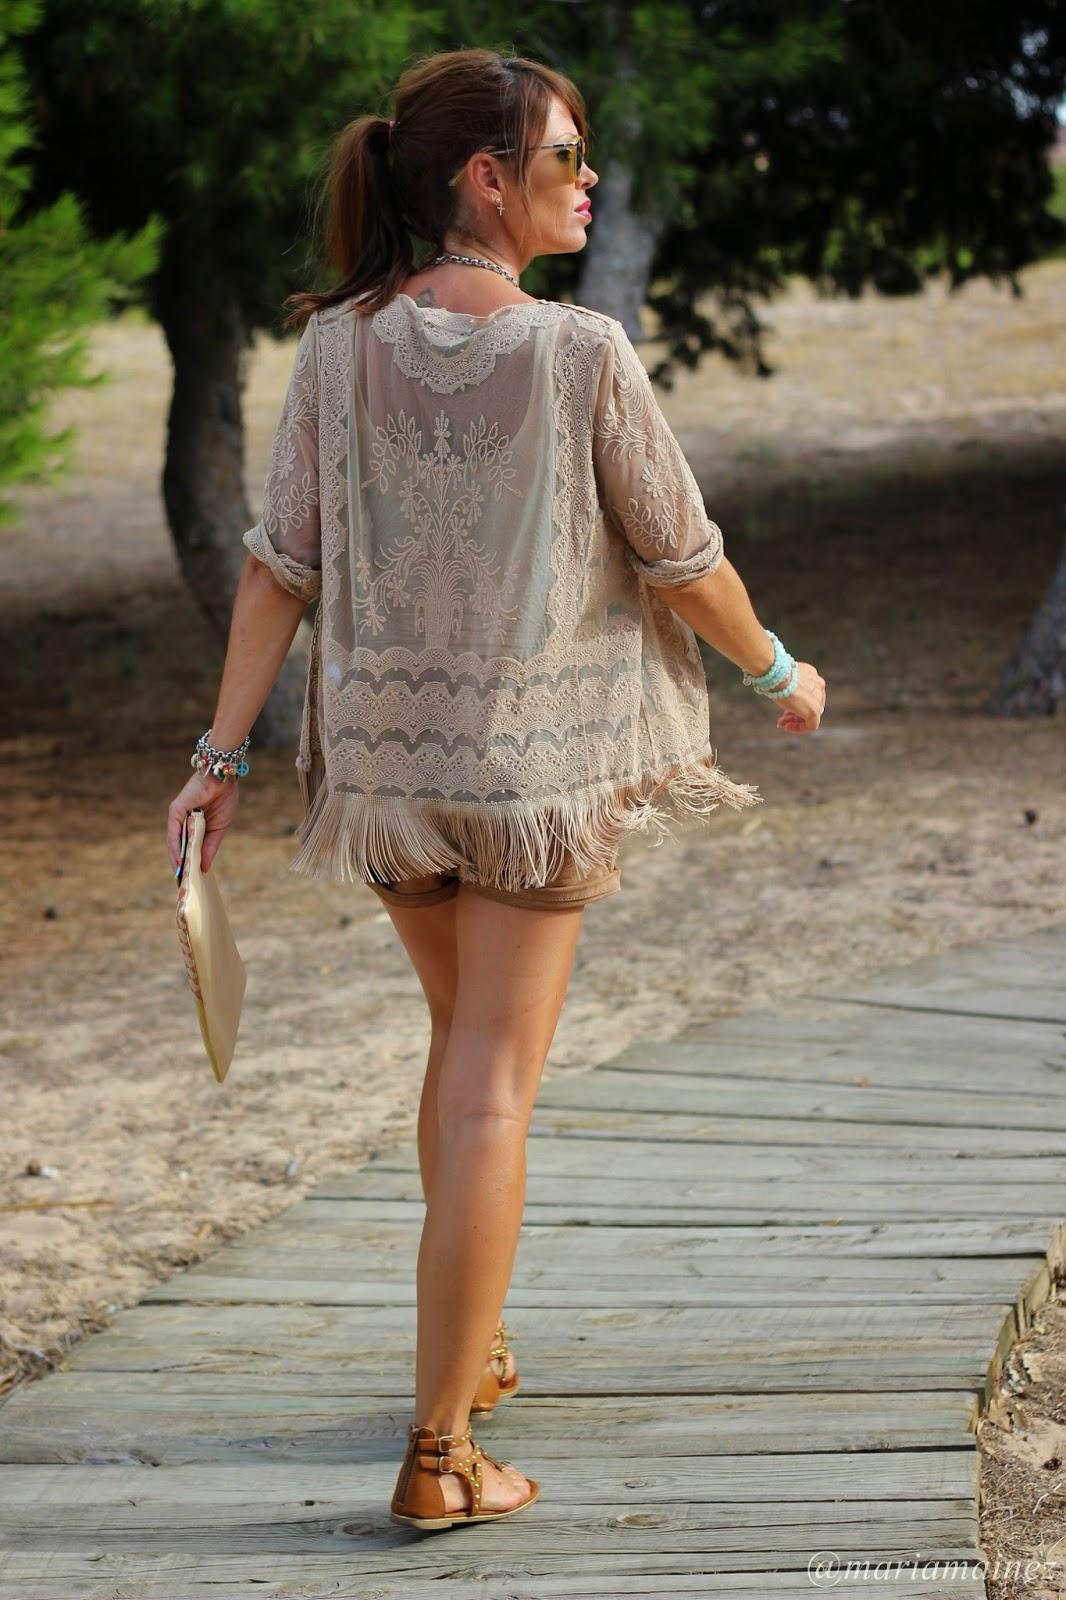 Tendencias Verano 2014 - Streetstyle 2014 - Blogger - Fashion